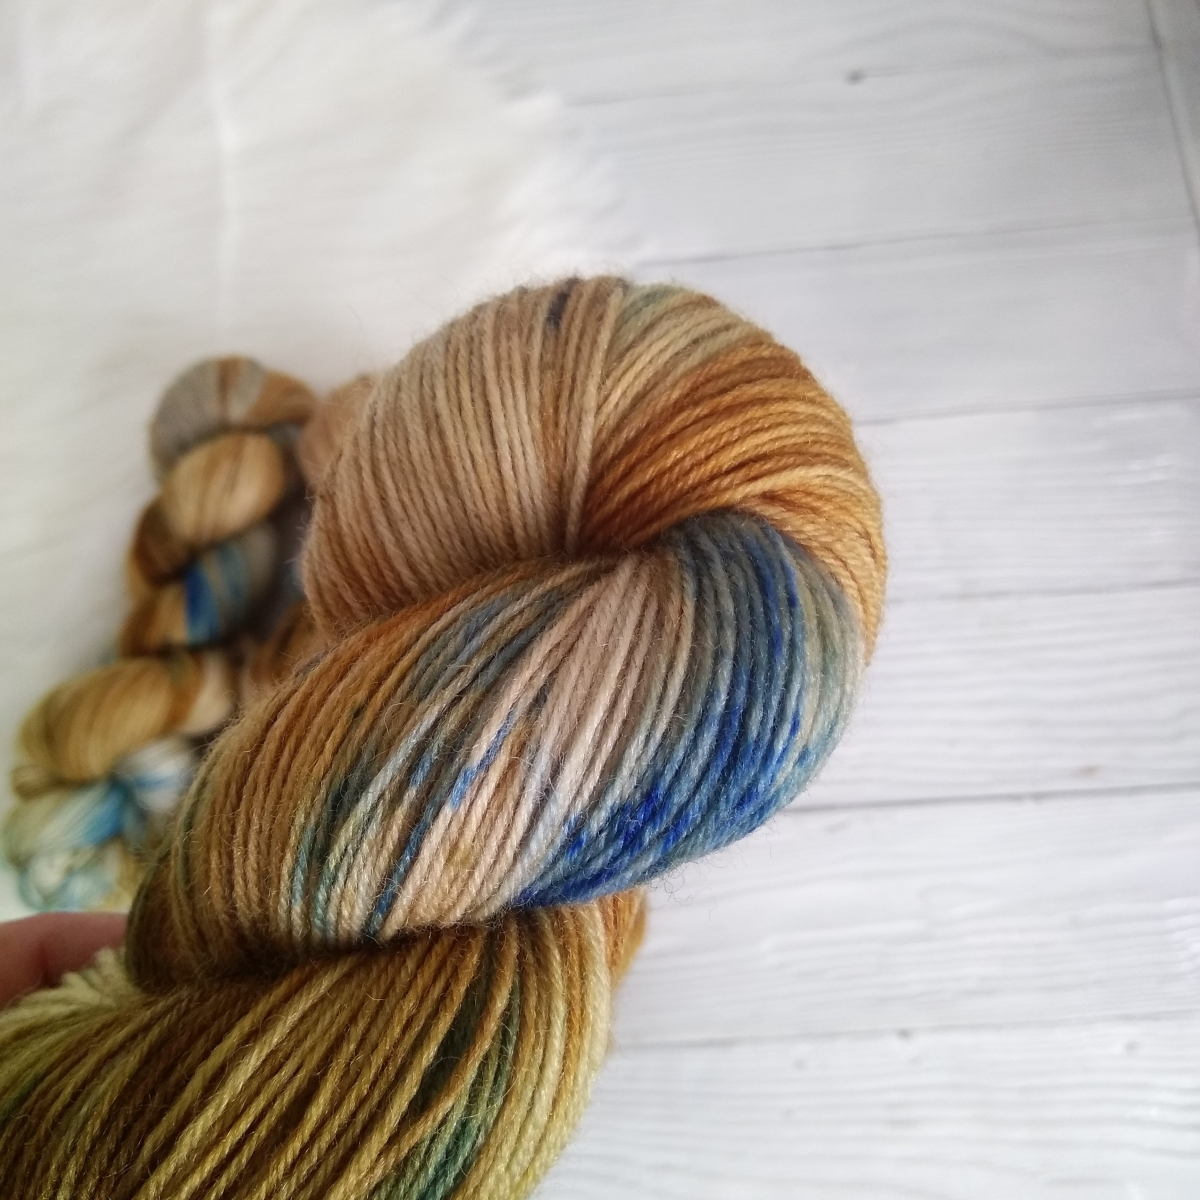 woodico.pro hand dyed yarn 036 5 1200x1200 - Hand dyed yarn / 036